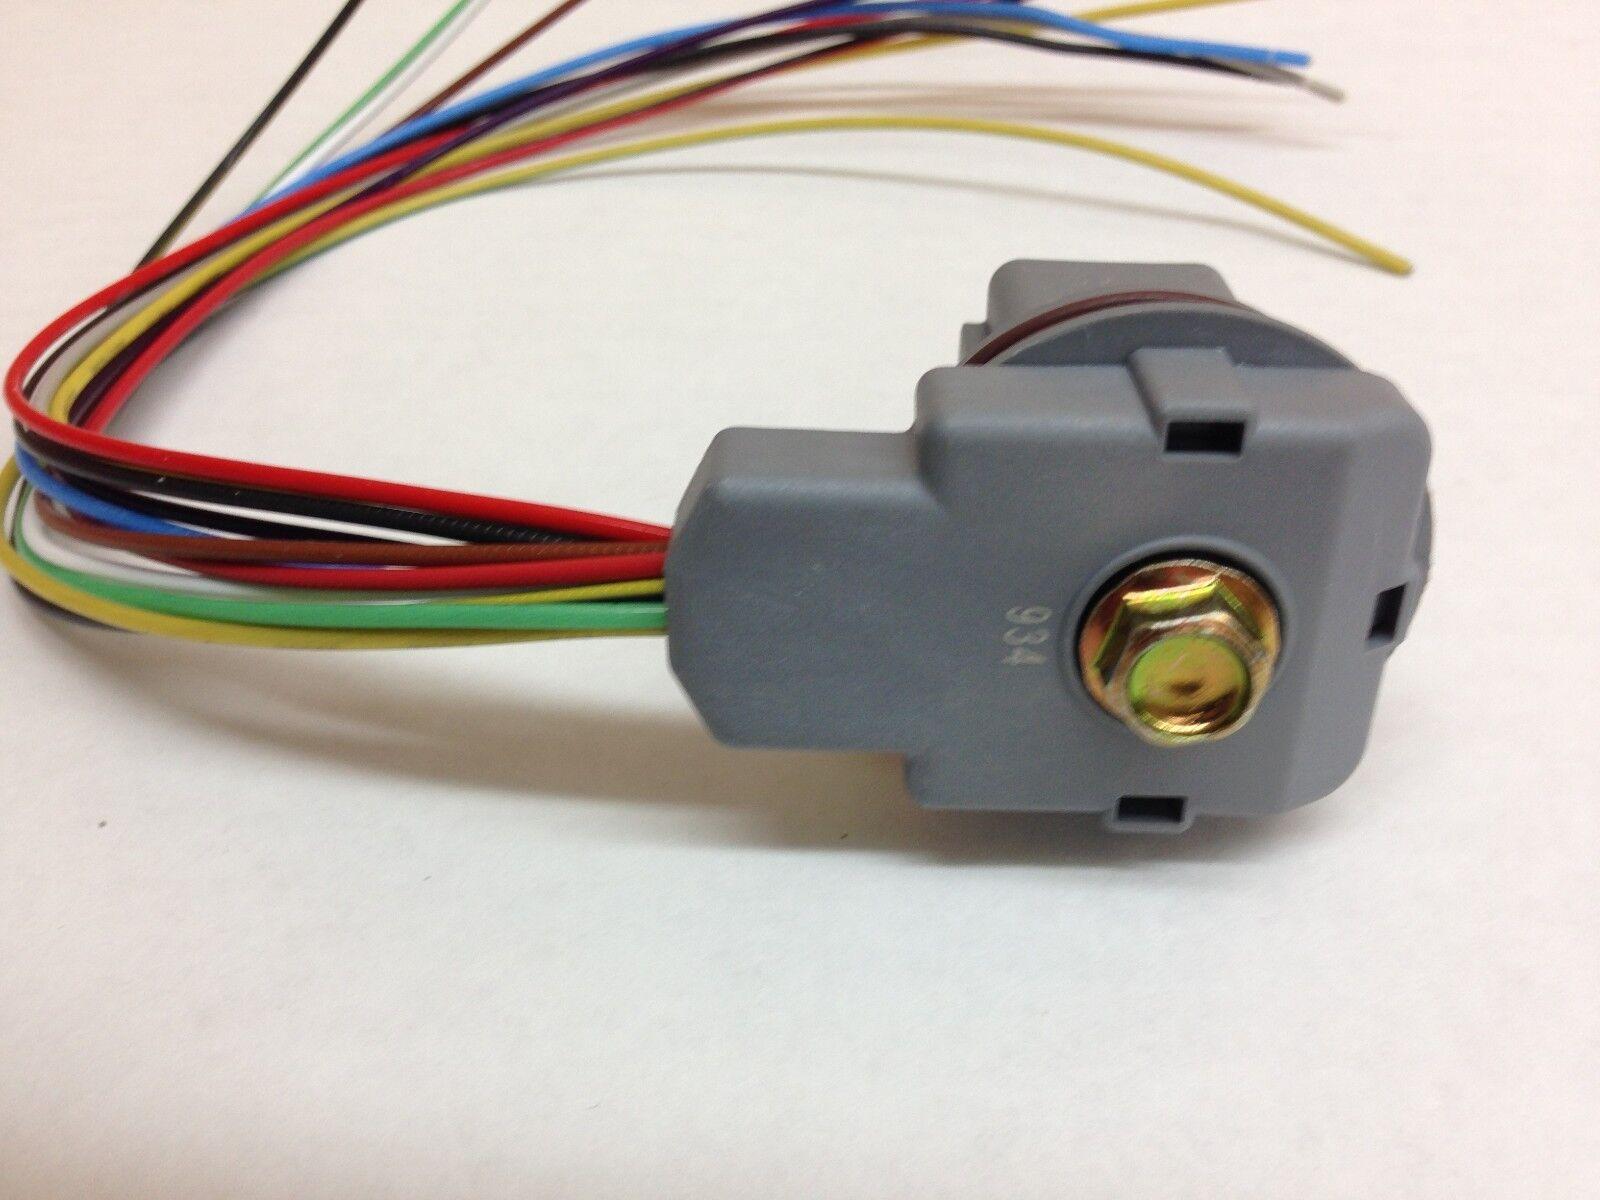 hight resolution of 5r55n 5r55s 5r55w explorer ranger external wiring harness repair kit for sale